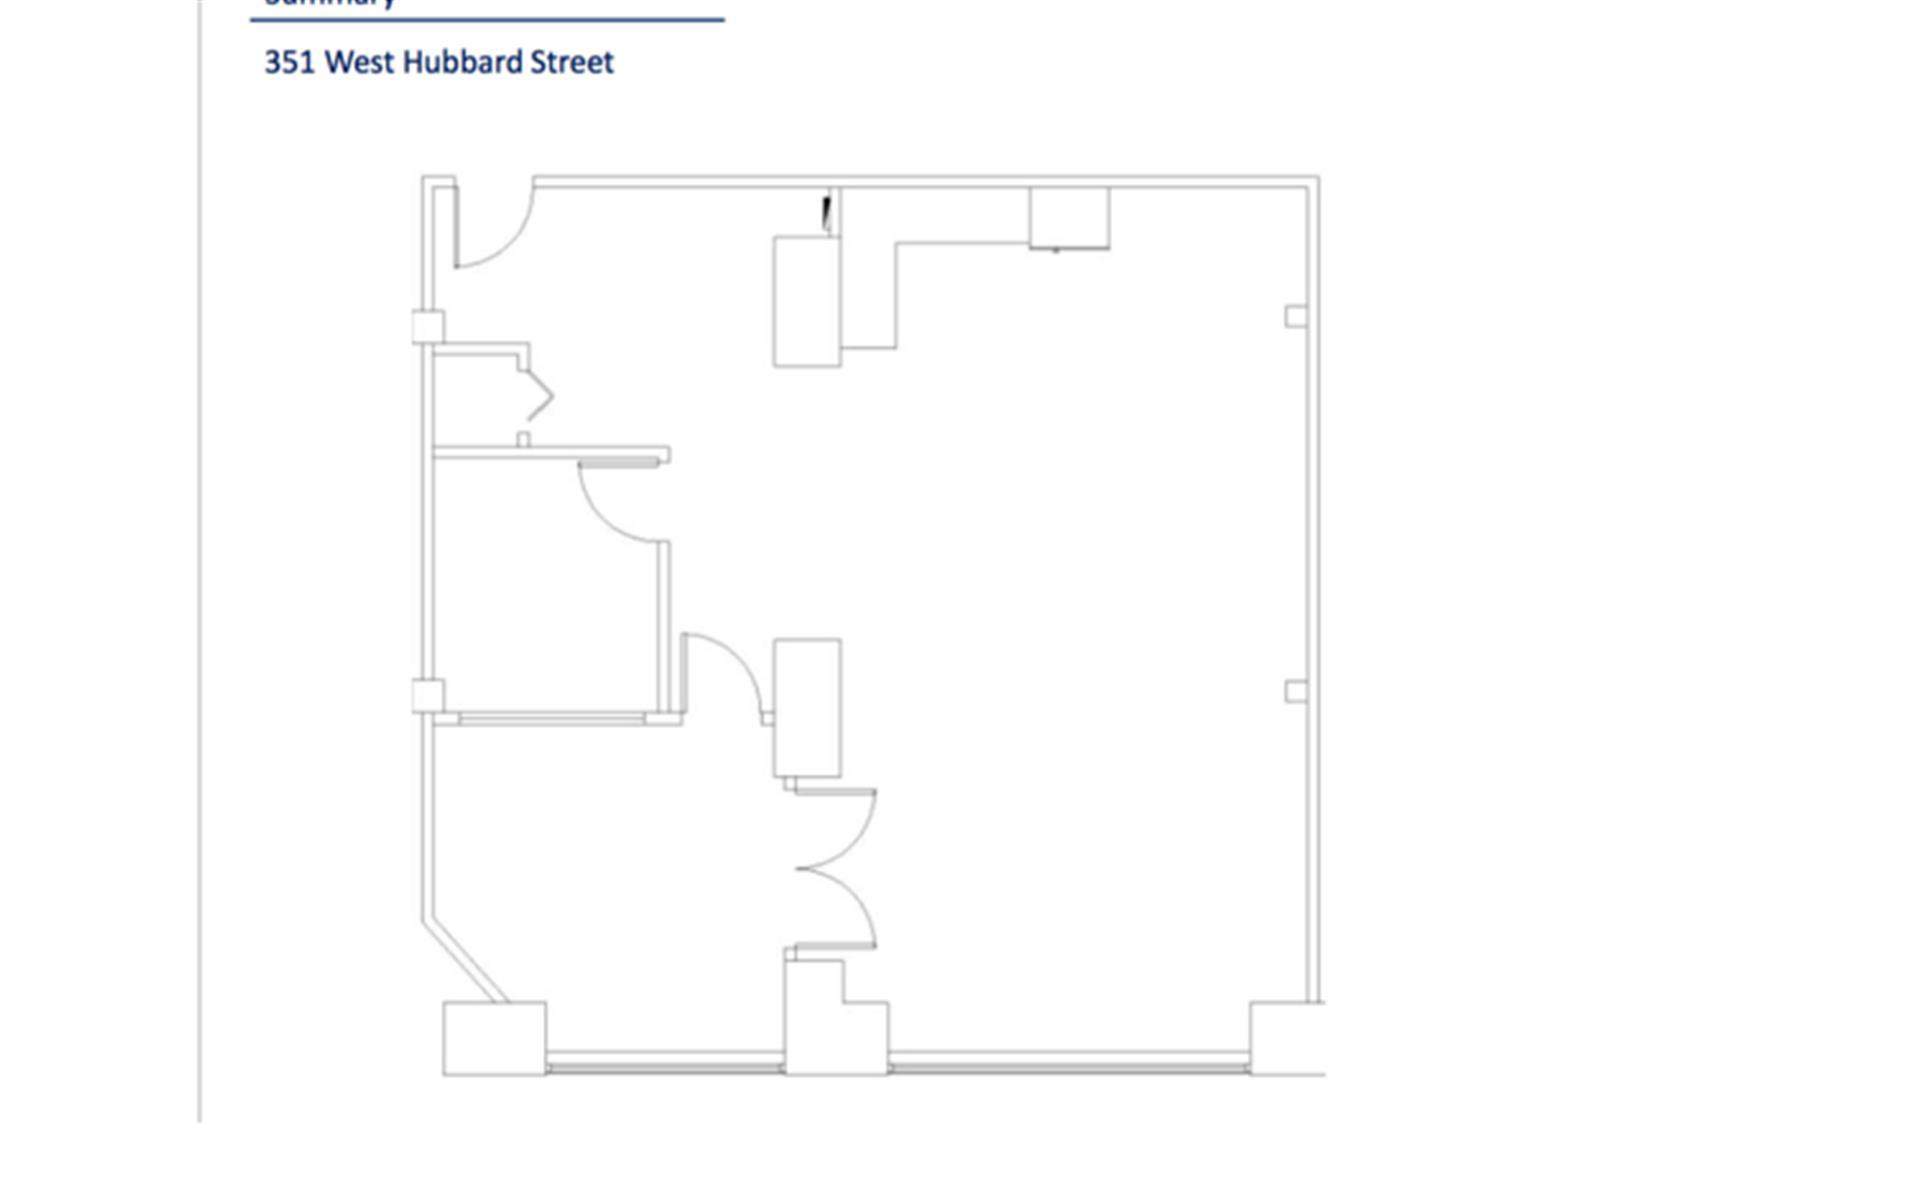 351 W Hubbard St - 3rd Floor